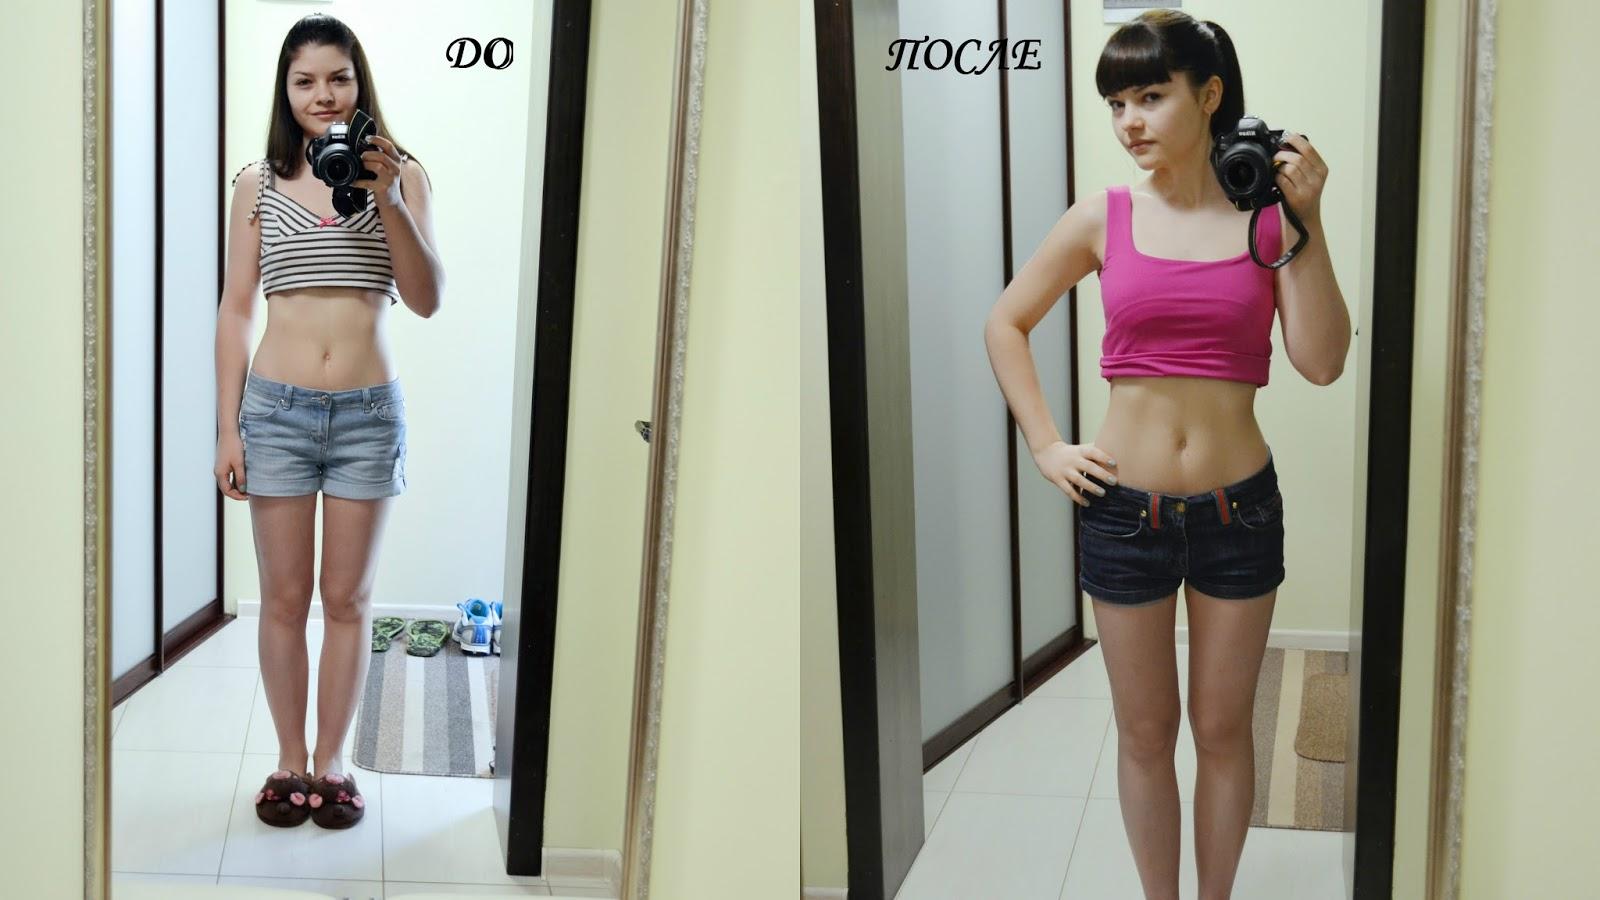 японская диета до и после фото